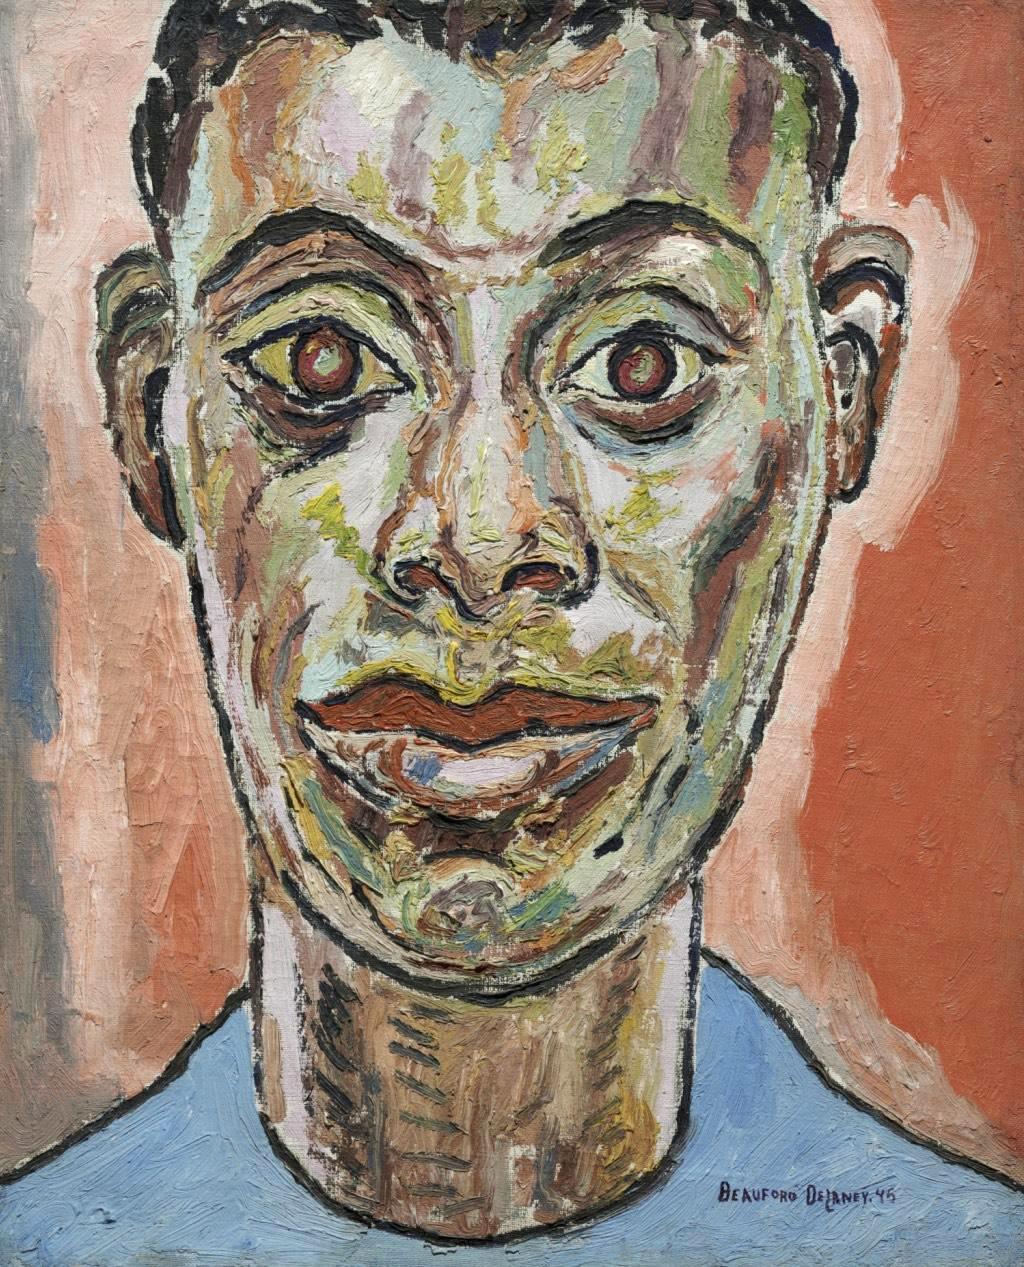 James-Baldwin-by-Beauford-Delaney-ooc.jpg